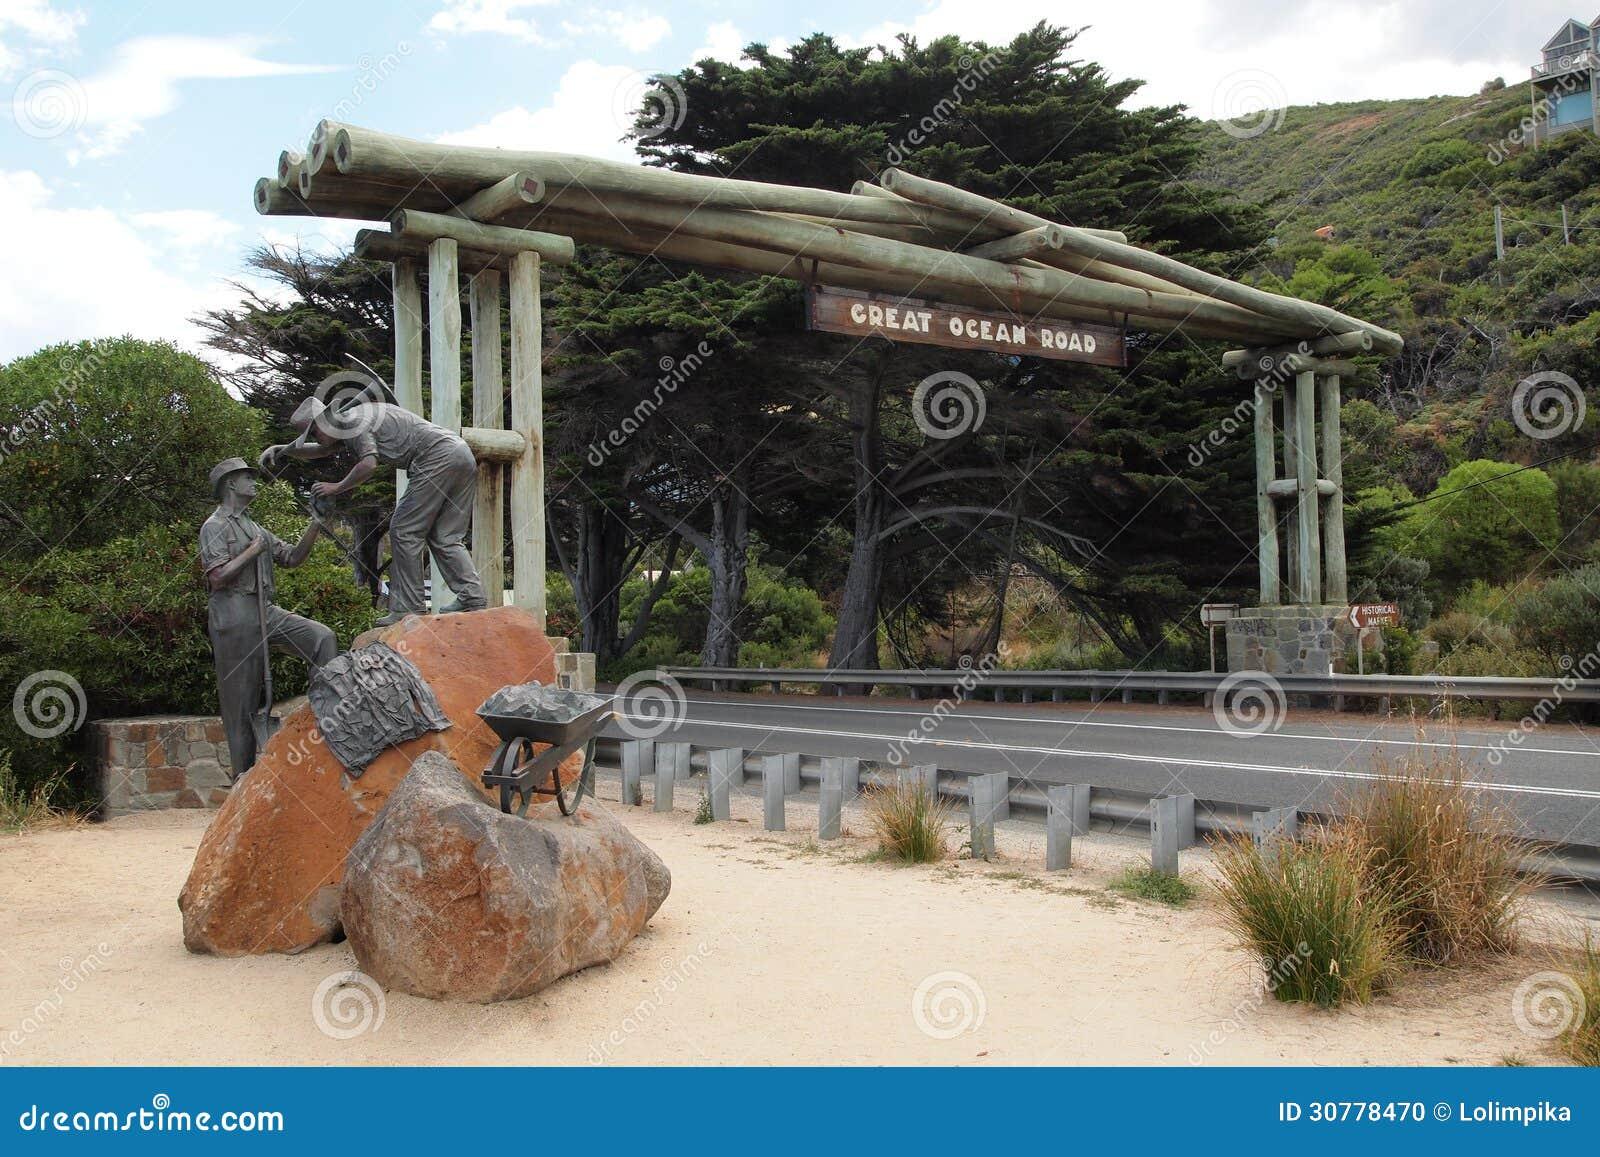 Great Ocean Road Memorial Arch, Victoria, Australia